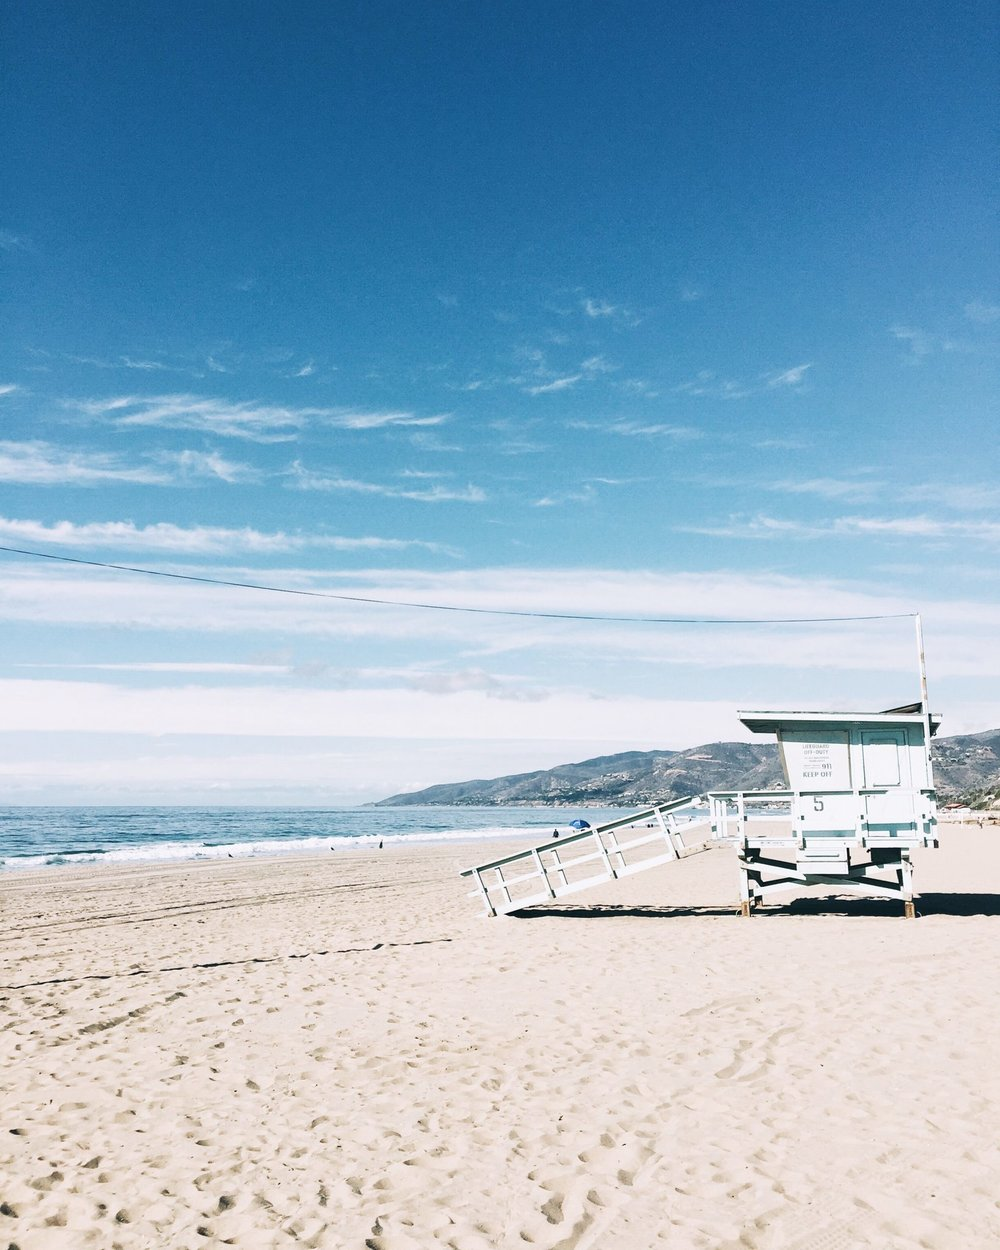 Zuma-Beach-Kopie.jpeg